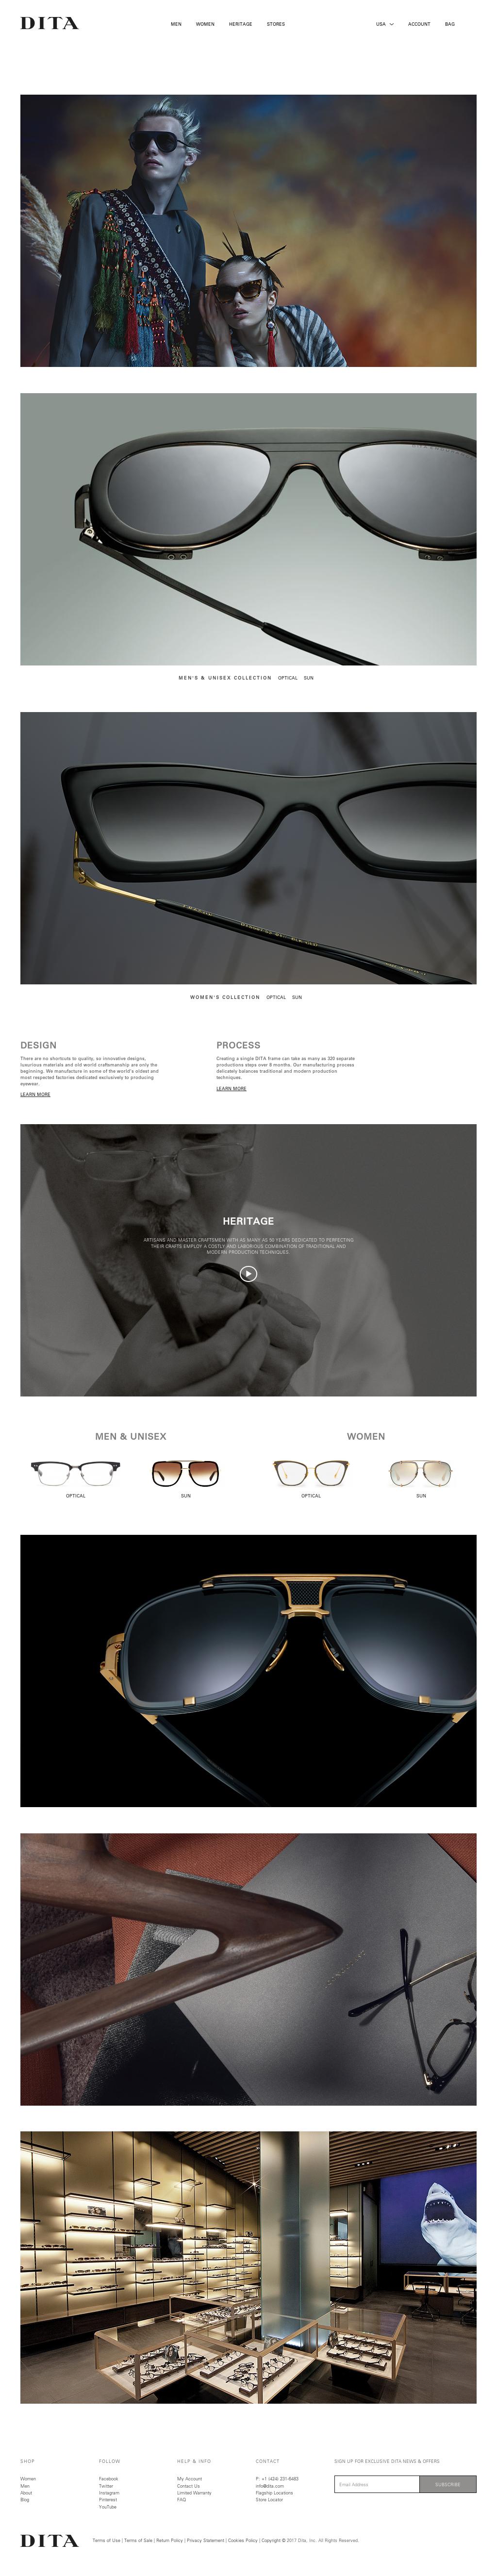 f54995e469 Dita Eyewear Competitors